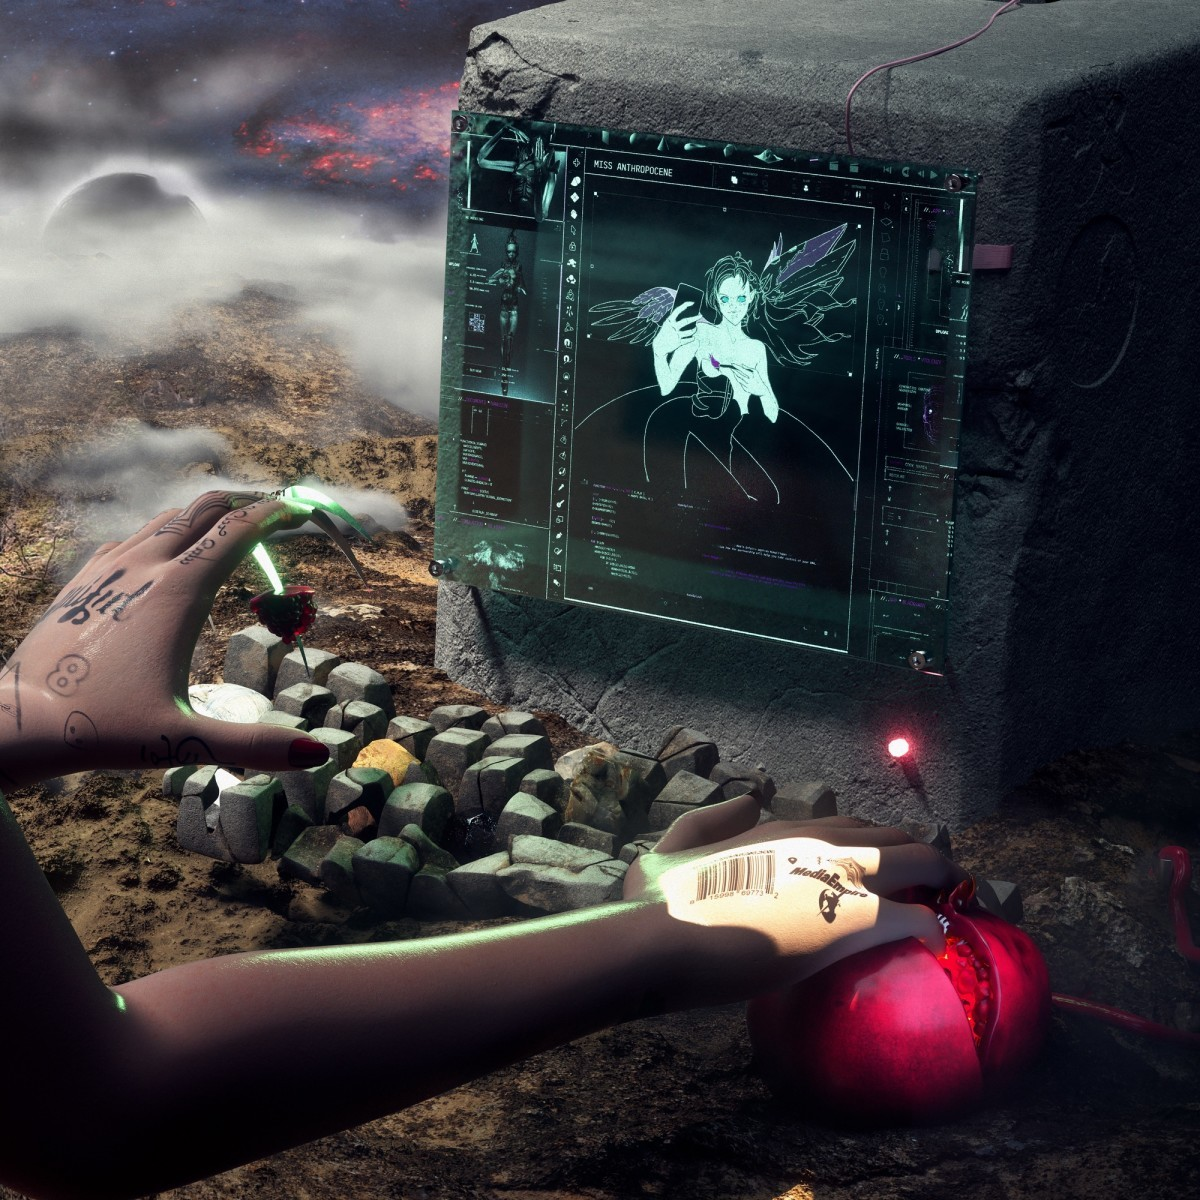 GRIMES - MISS ANTHROPOCENE album artwork